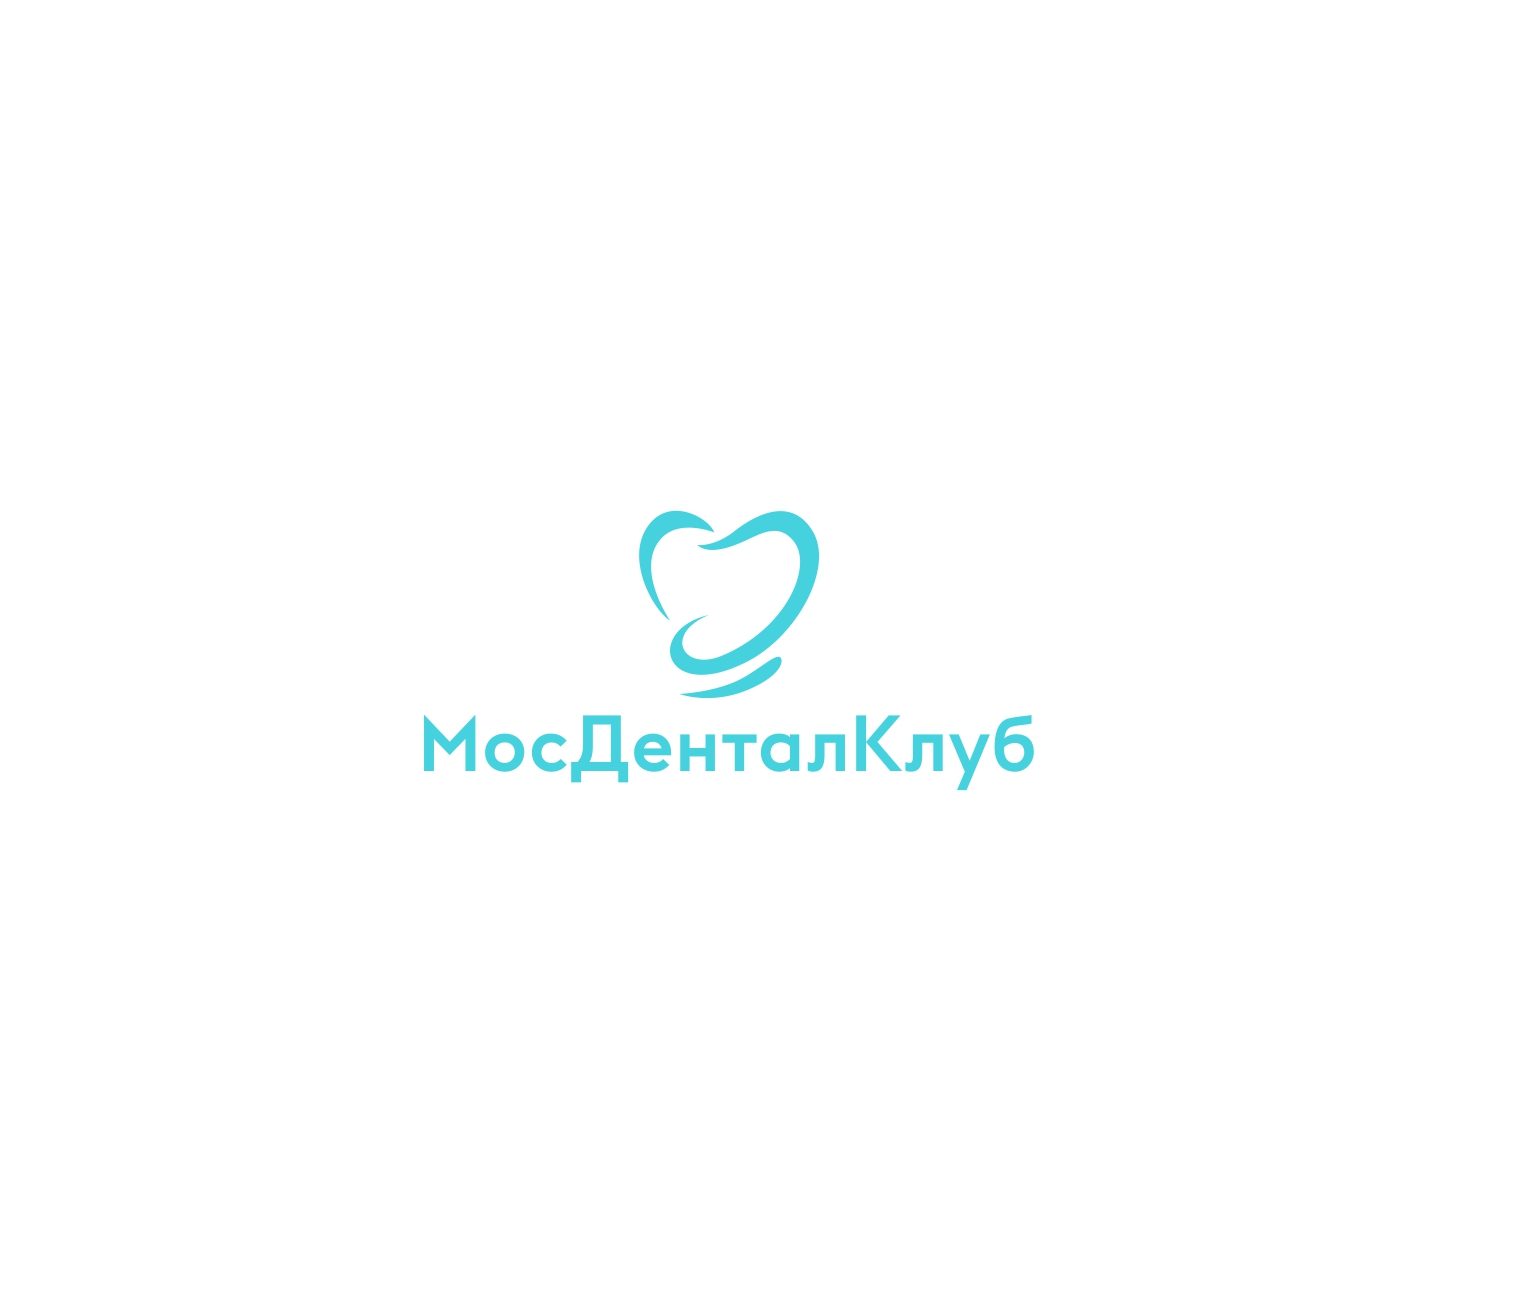 Разработка логотипа стоматологического медицинского центра фото f_0265e457ce5b22e8.jpg